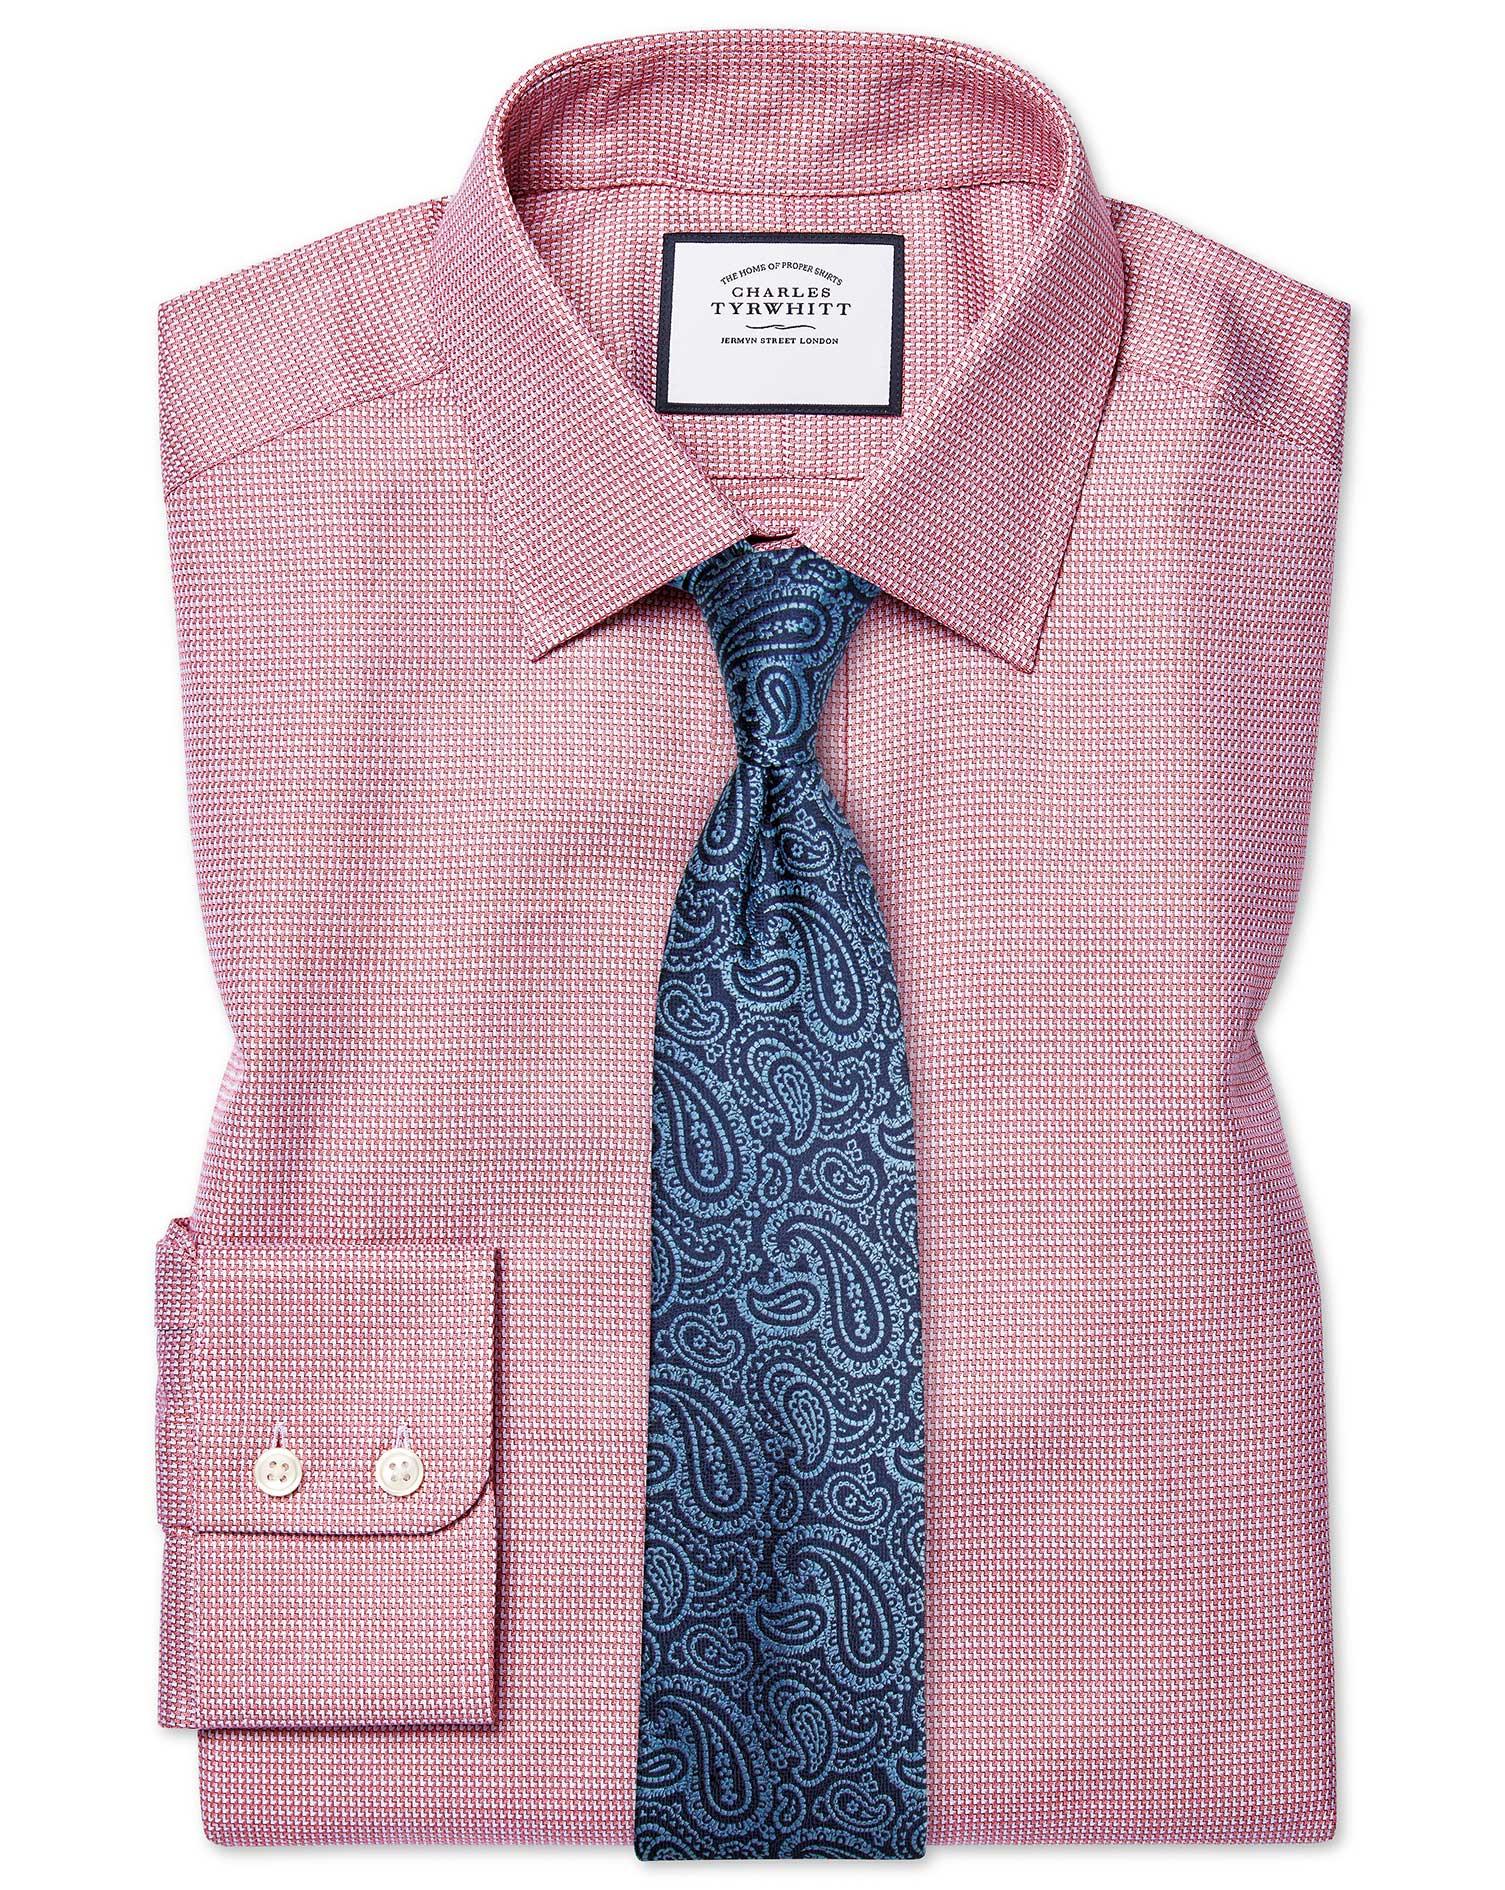 Classic Fit Egyptian Cotton Chevron Pink Shirt